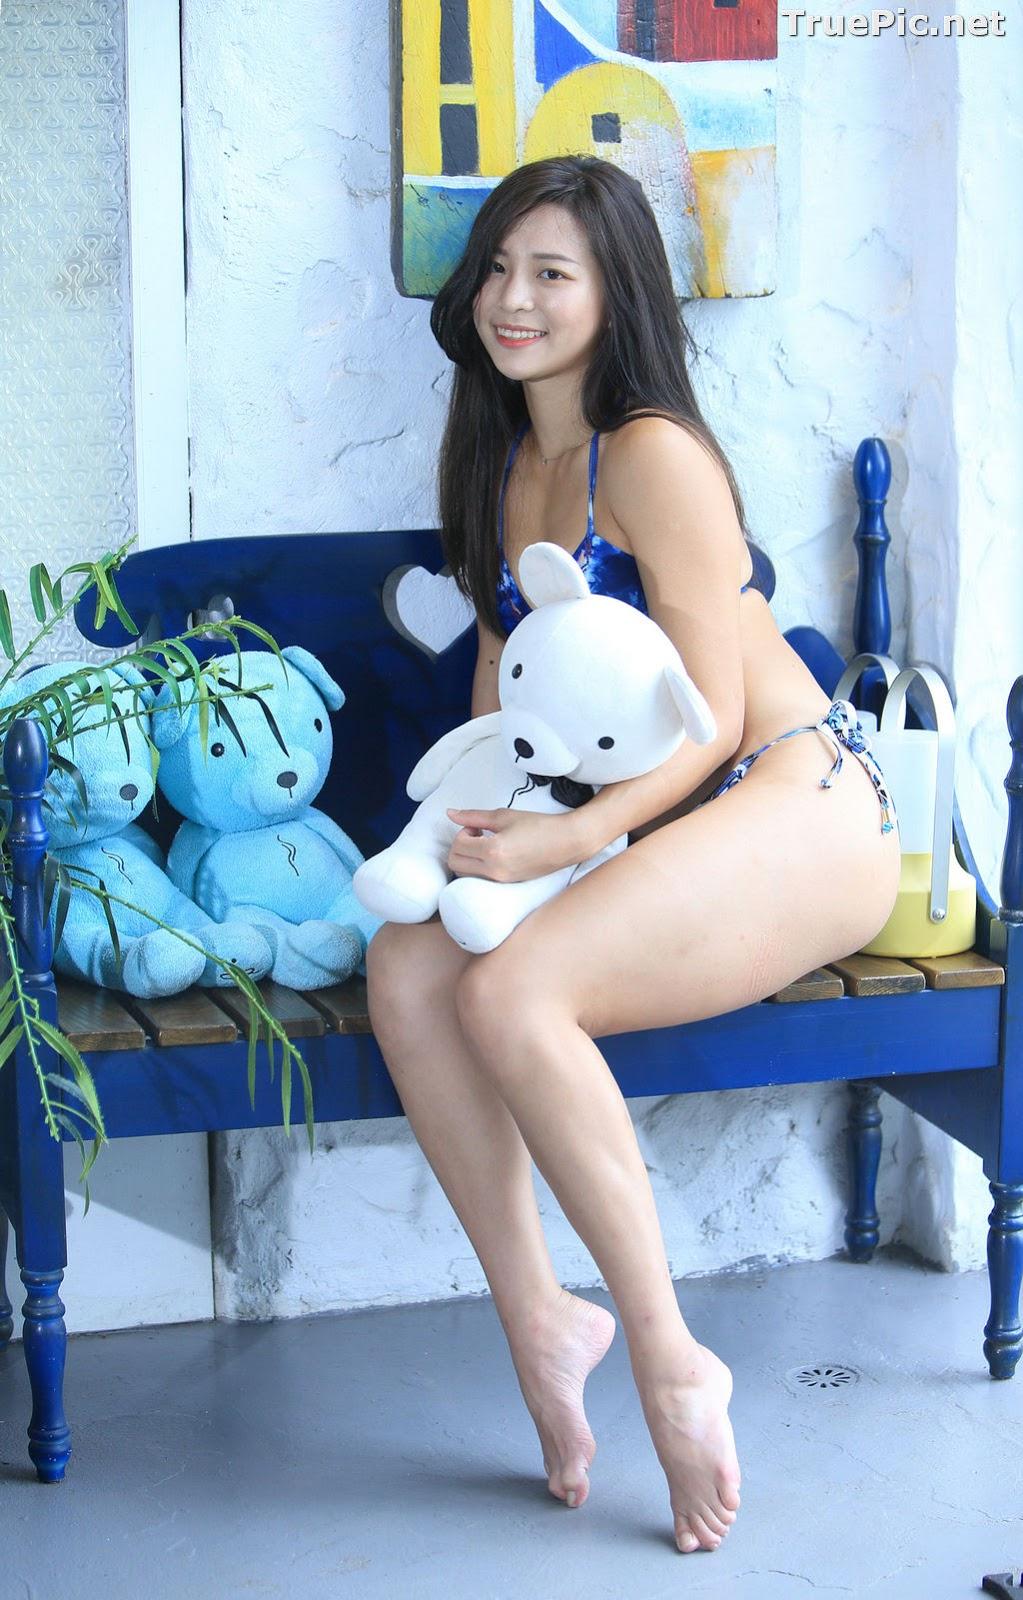 Image Taiwanese Model - Shelly - Beautiful Bodybuilding Bikini Girl - TruePic.net - Picture-8